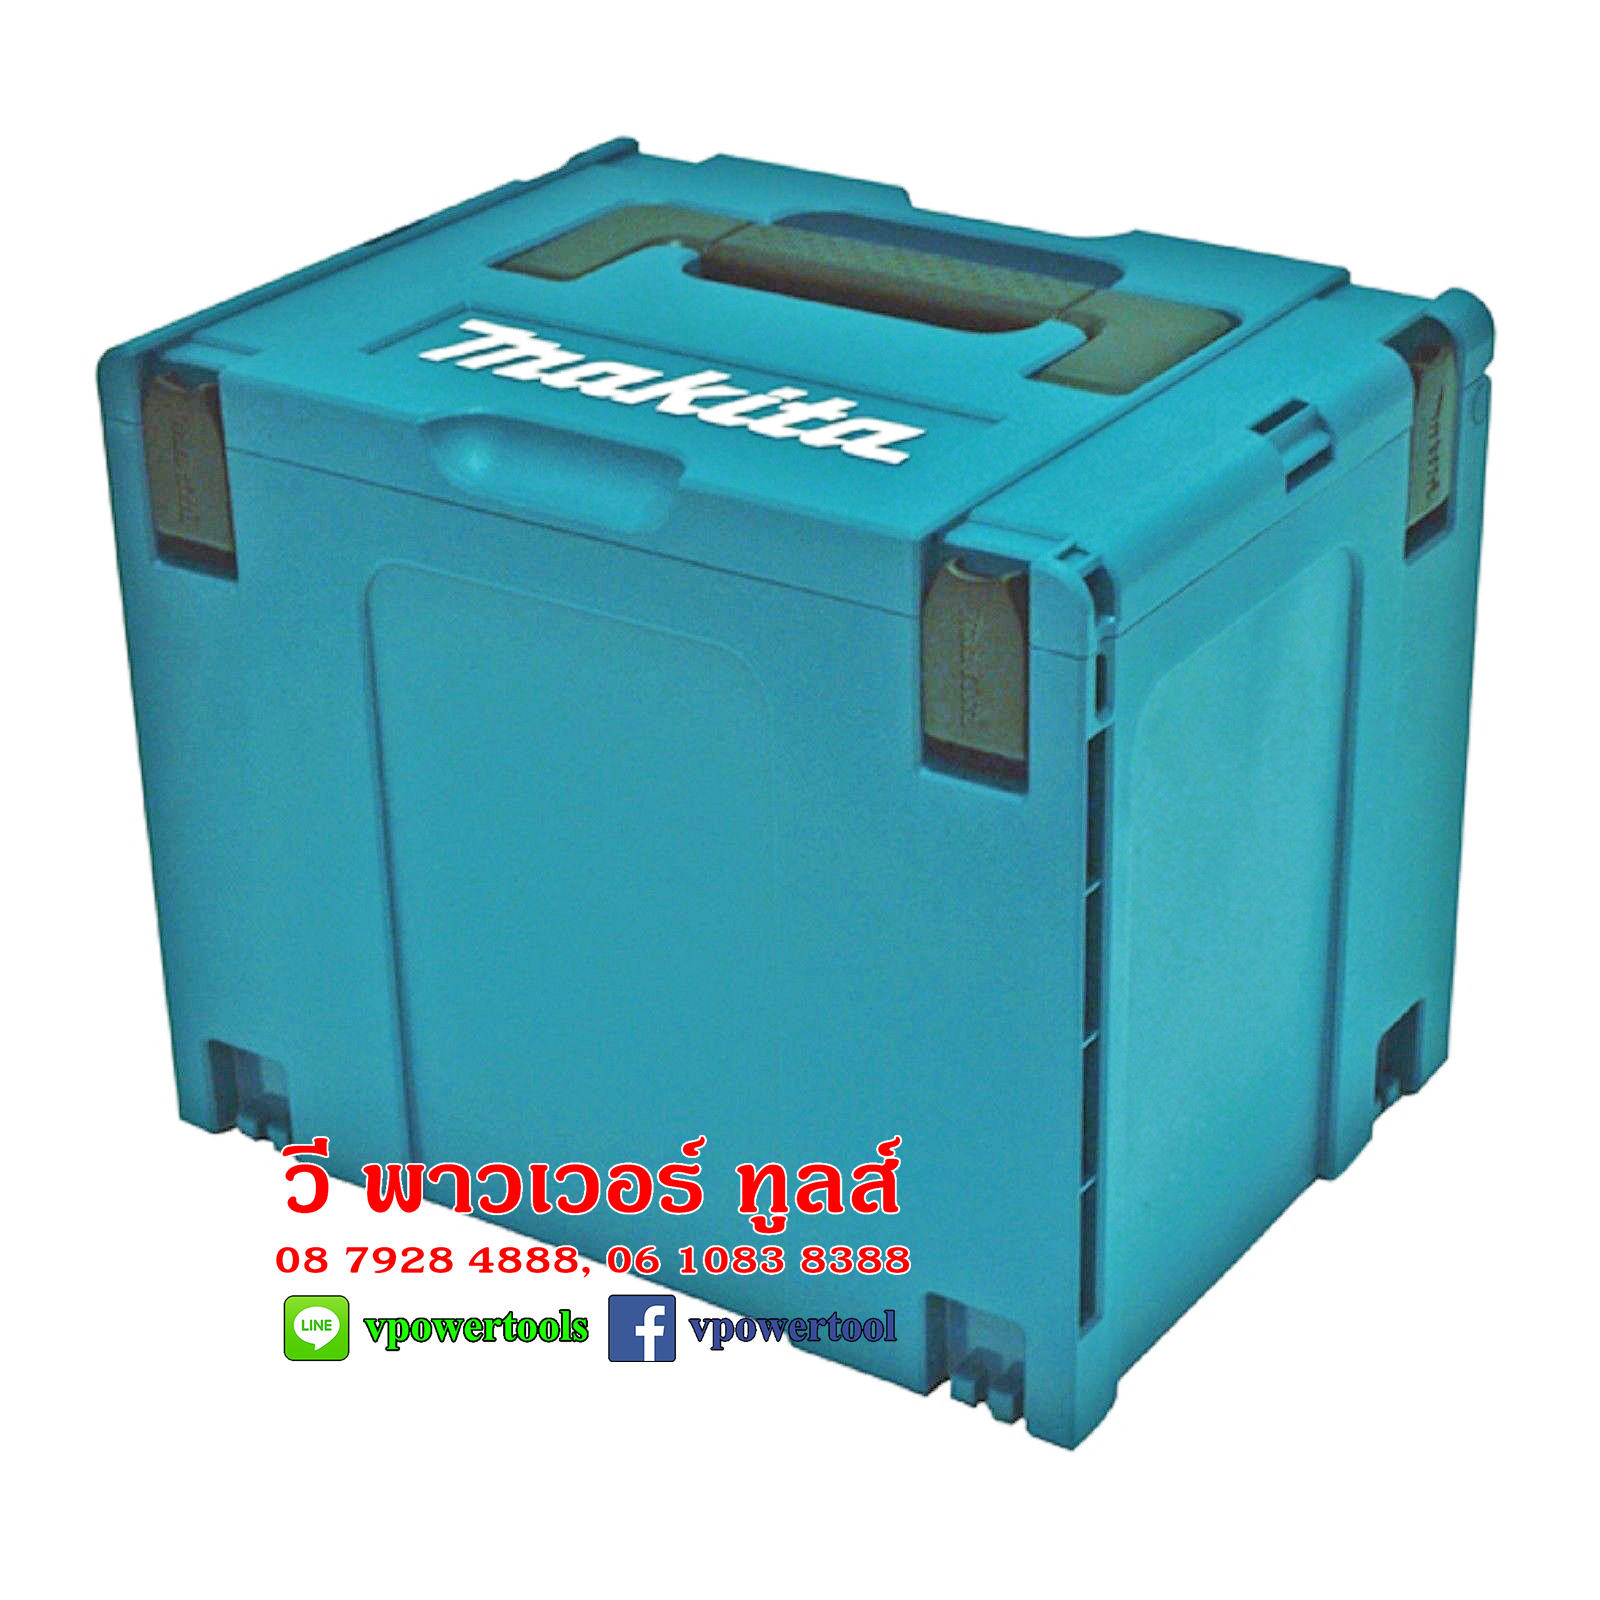 MAKITA MAKPAC Interlocking Cases กล่องใส่เครื่องมือ ตัวล็อก4มุม วางซ้อนกันได้หลายชั้น ขนาดใหญ่สุด XL